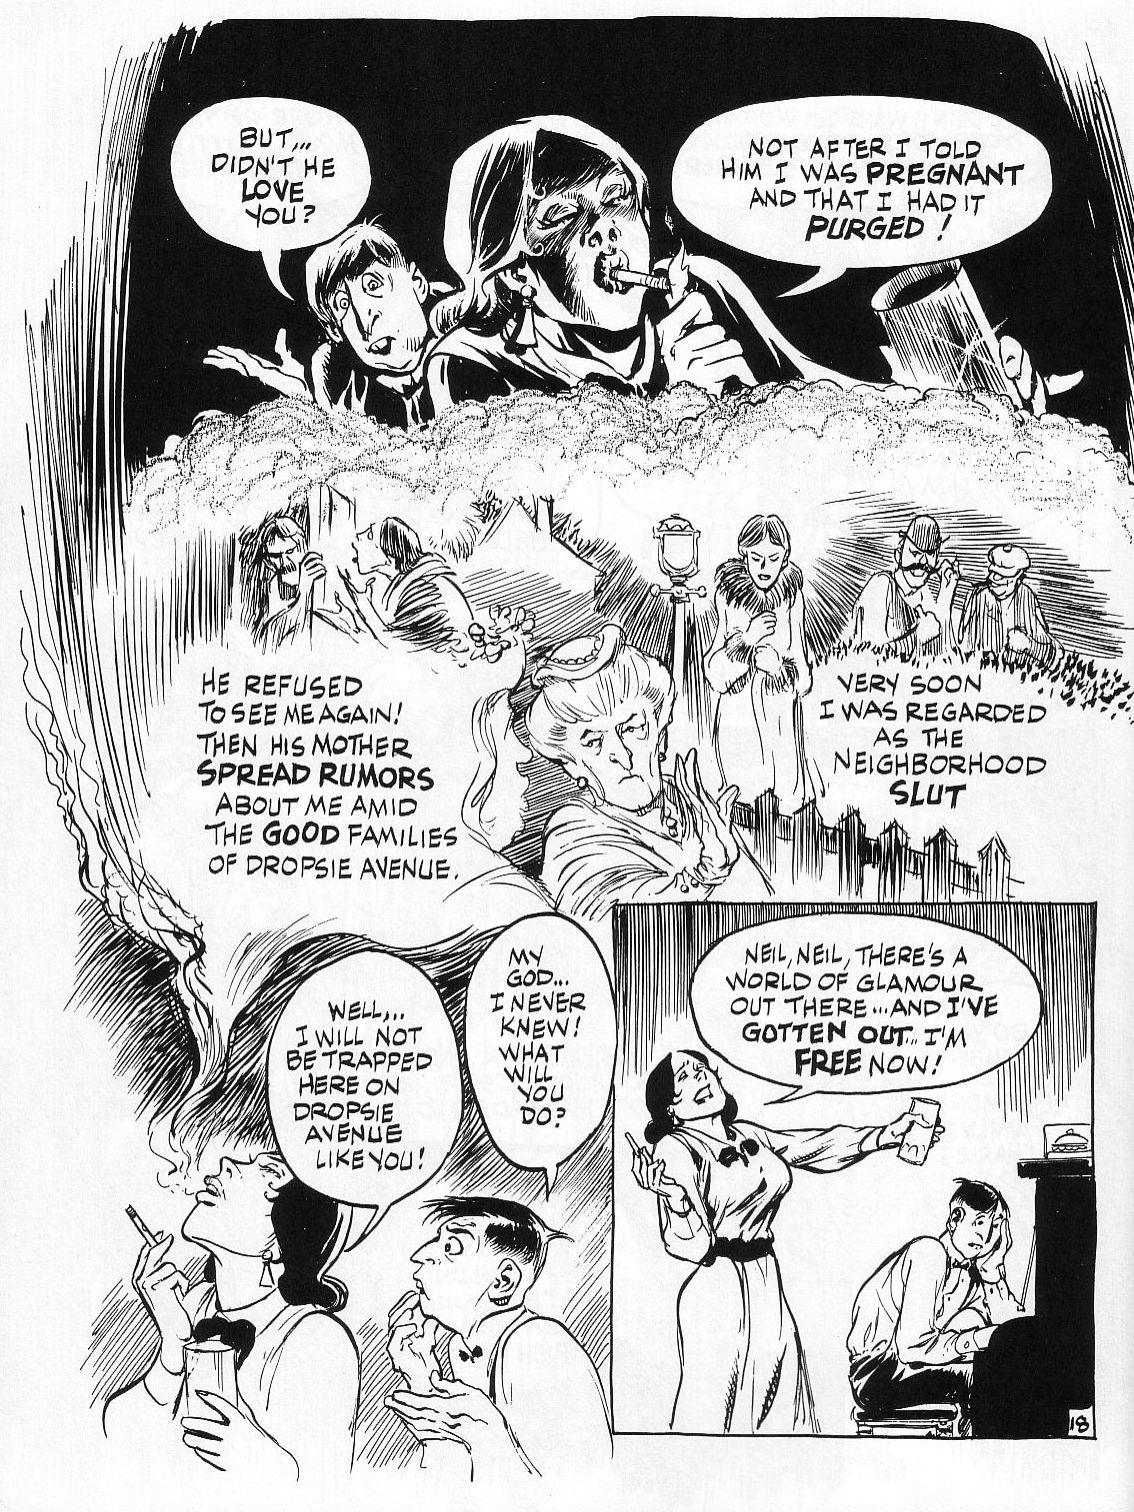 Read online Dropsie Avenue, The Neighborhood comic -  Issue # Full - 20